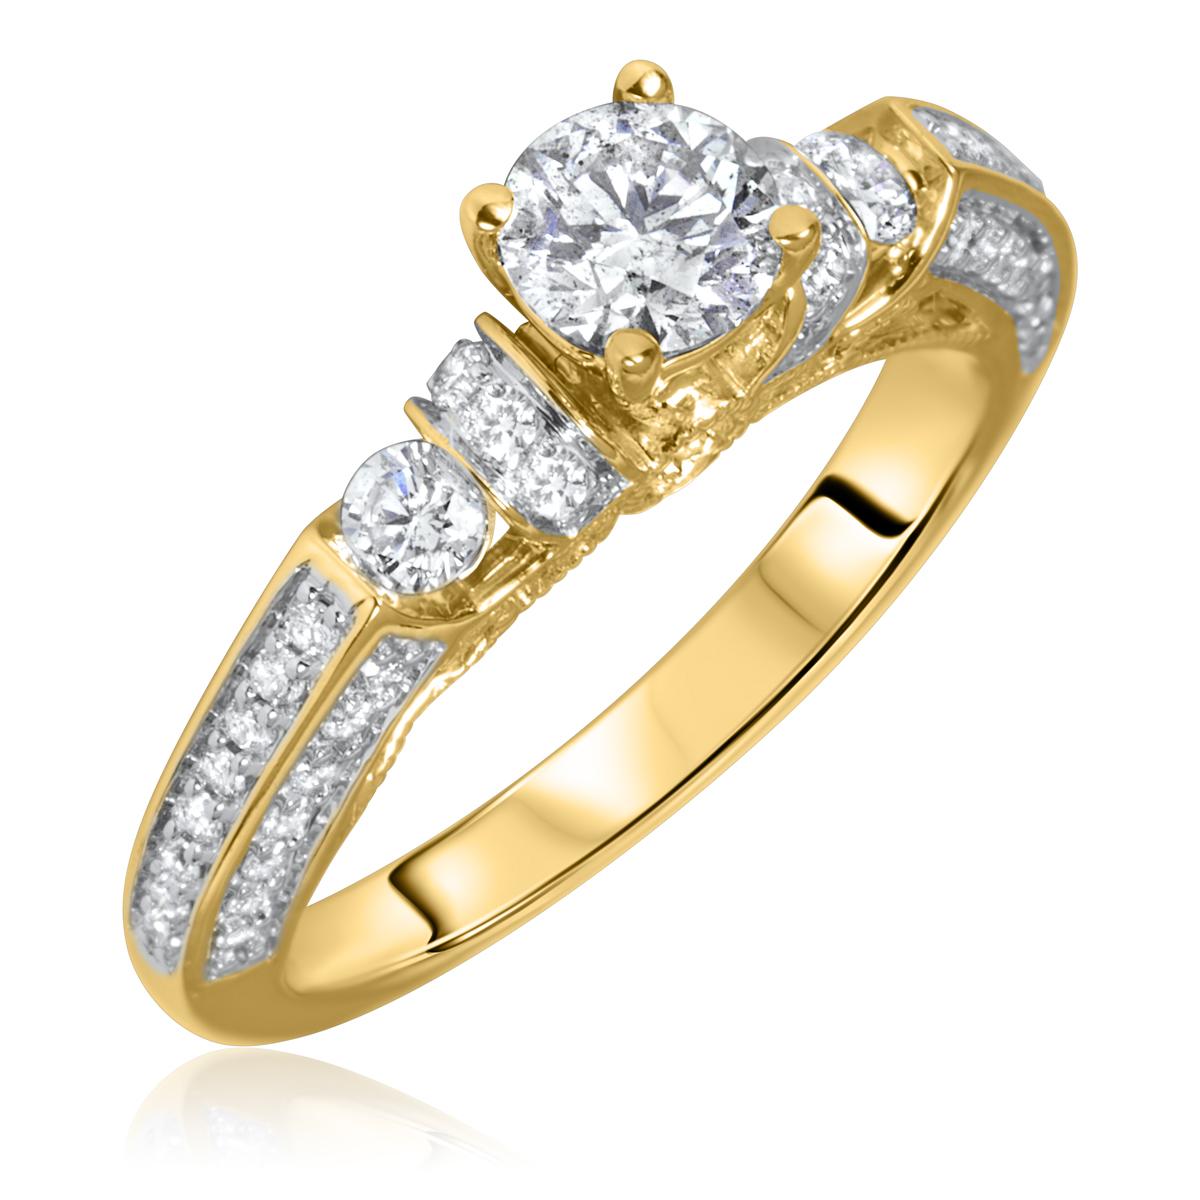 1 1/10 Carat T.W. Round Cut Diamond Ladies Engagement Ring 10K Yellow Gold- Size